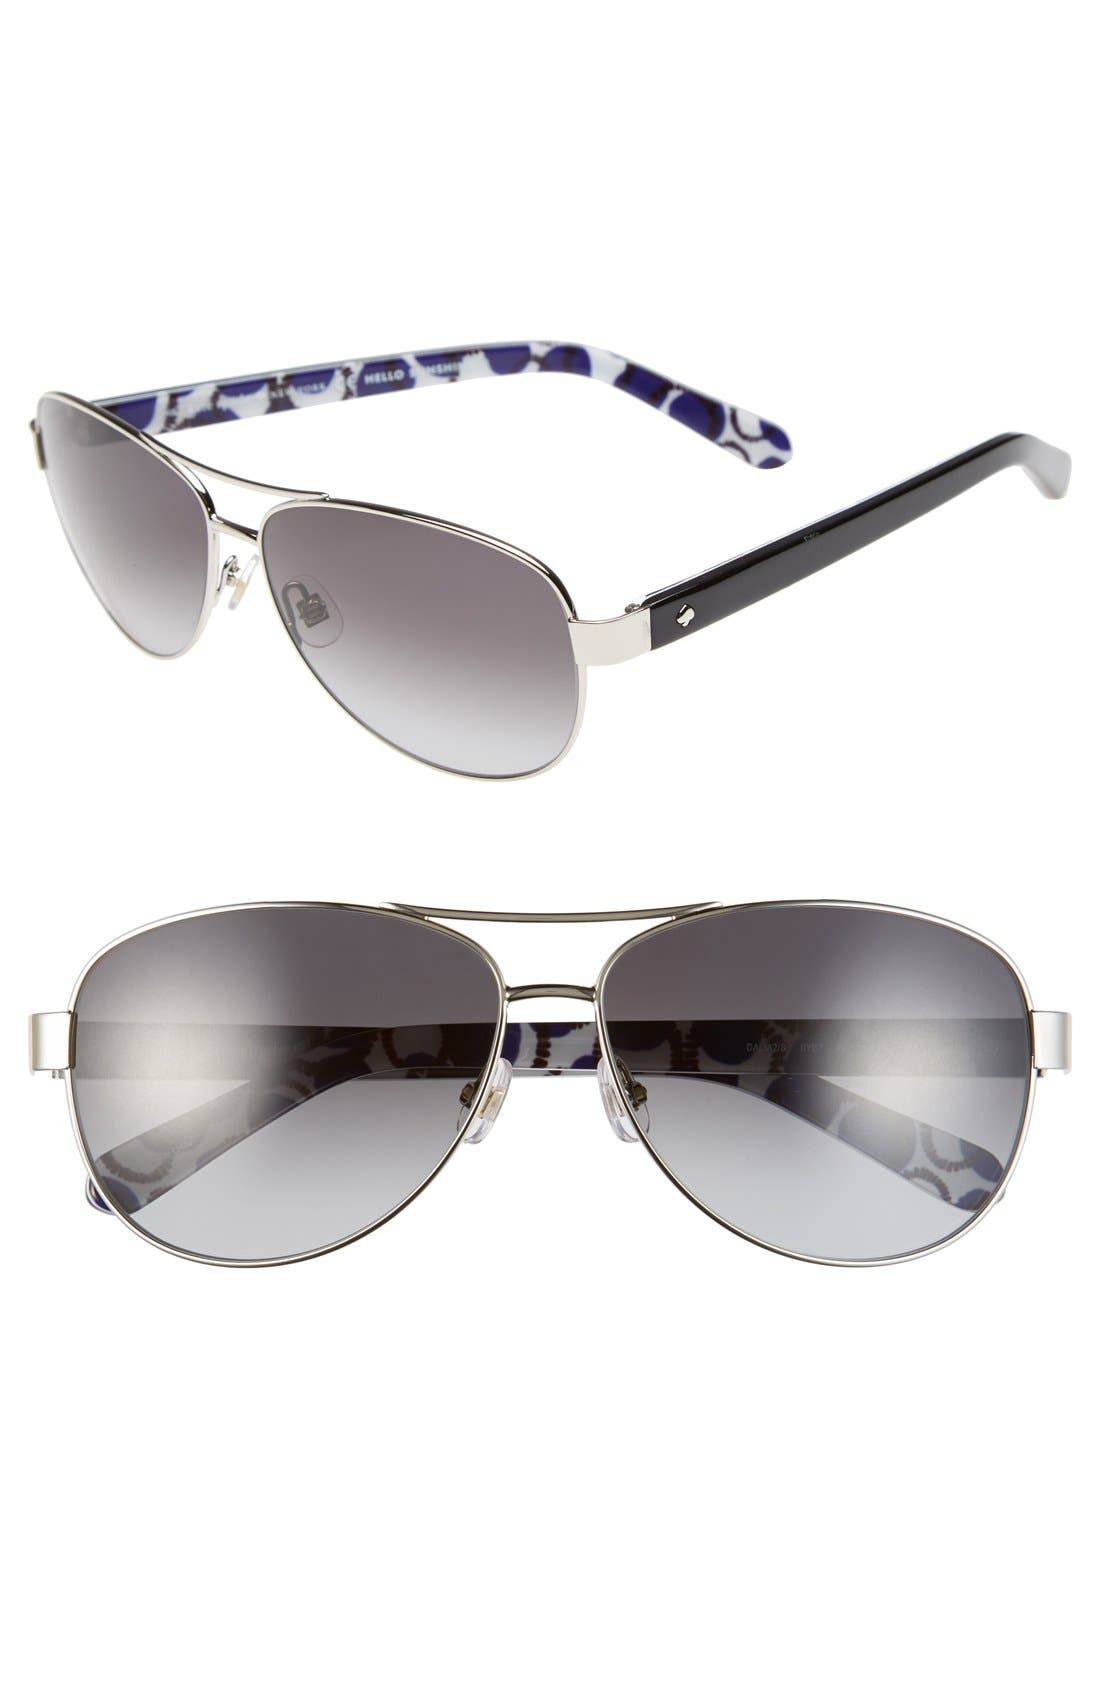 Main Image - kate spade new york 'dalia2' 58mm aviator sunglasses